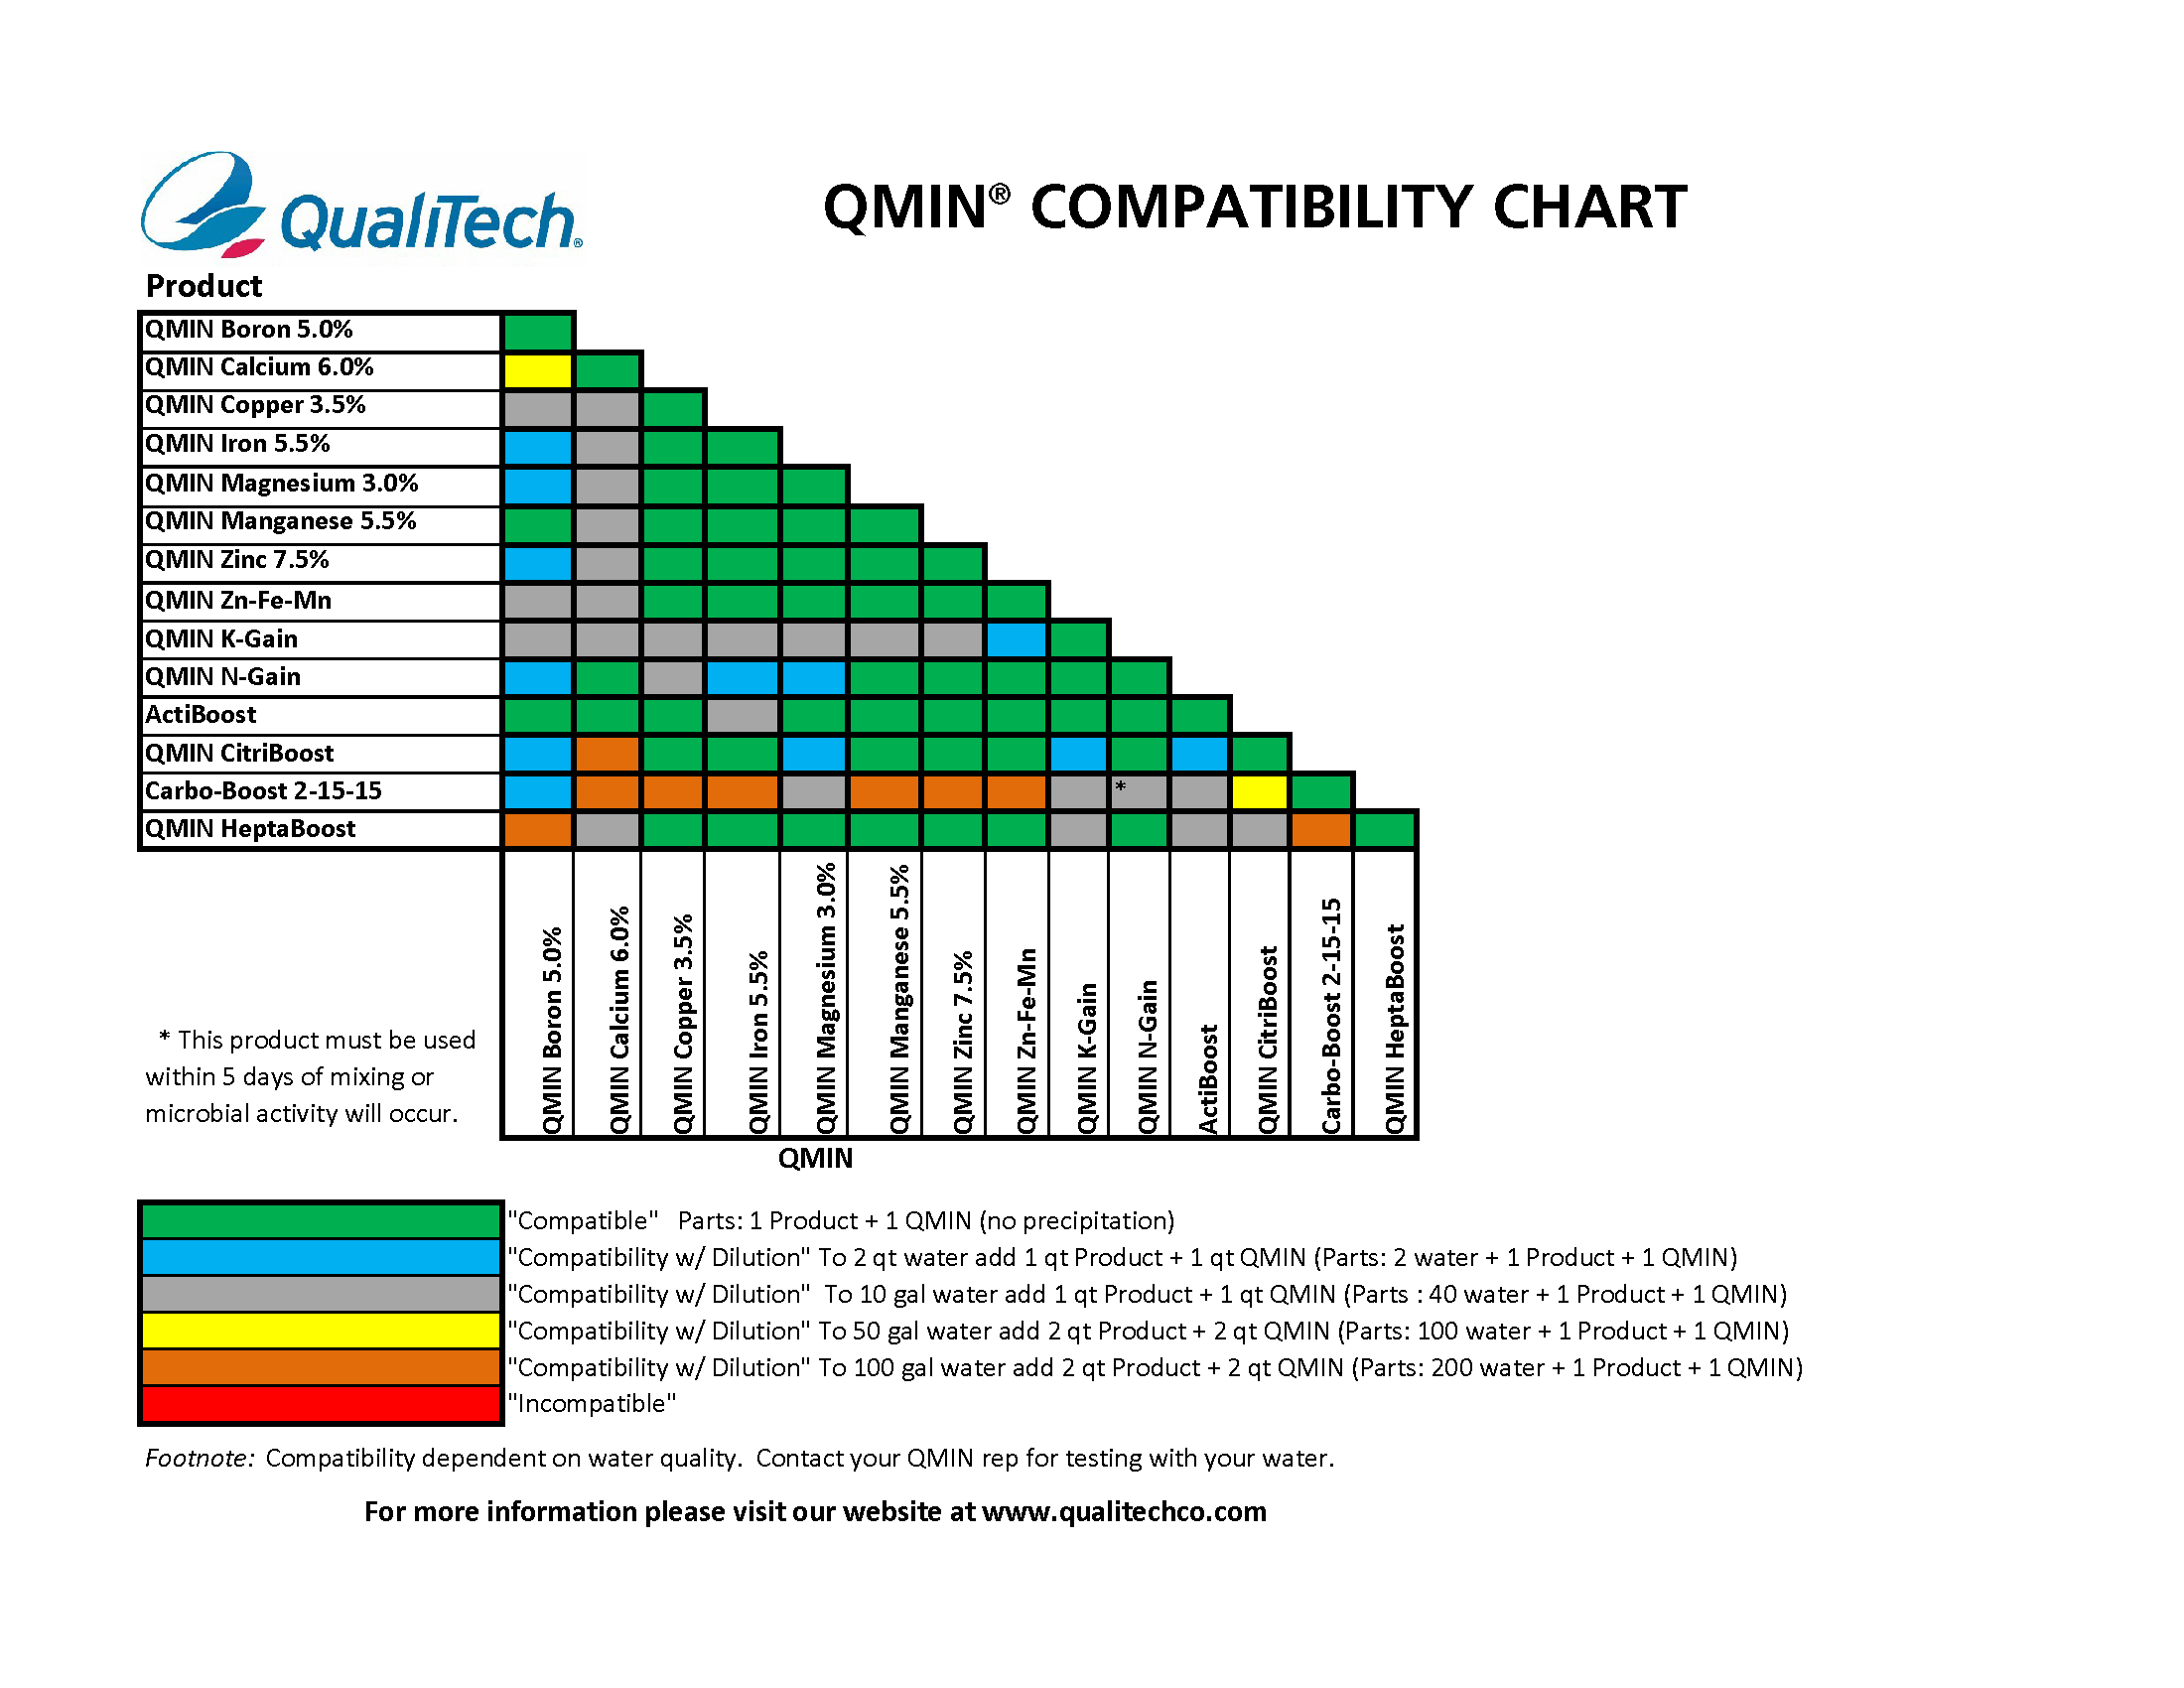 folliar-compatability-chart